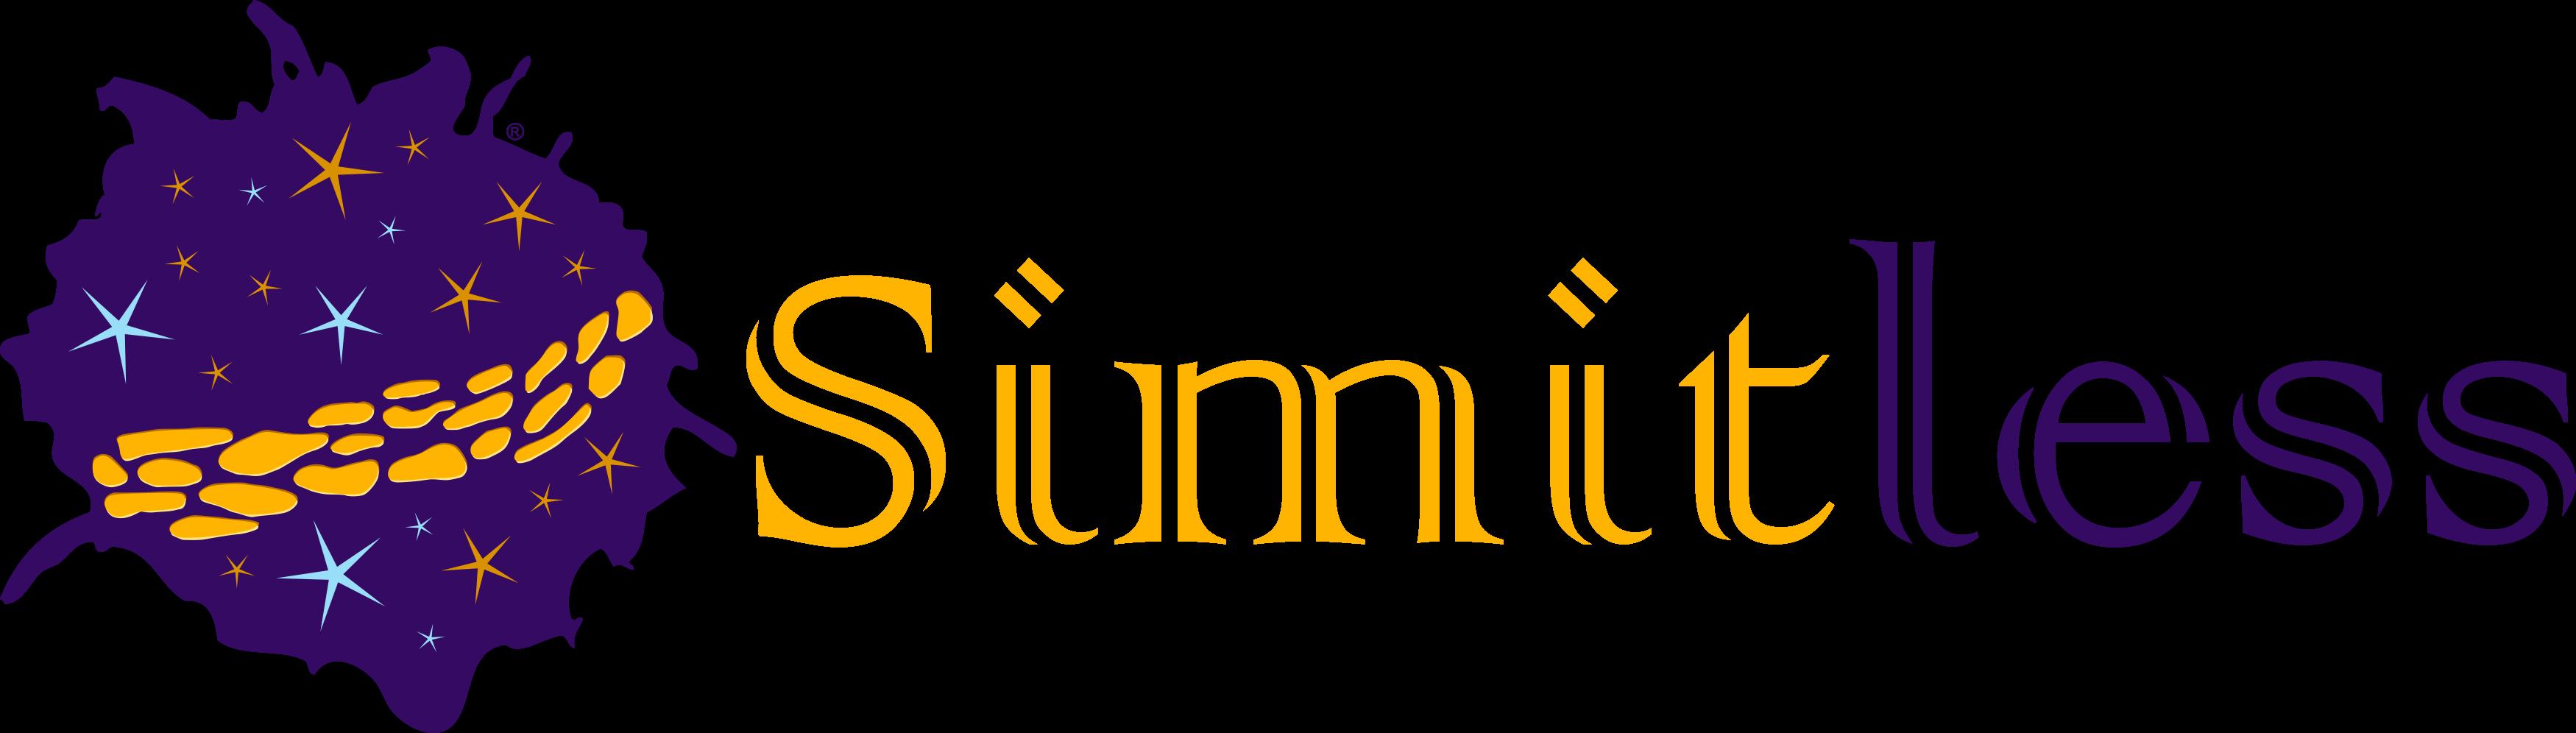 Simitless logo horizontal with name